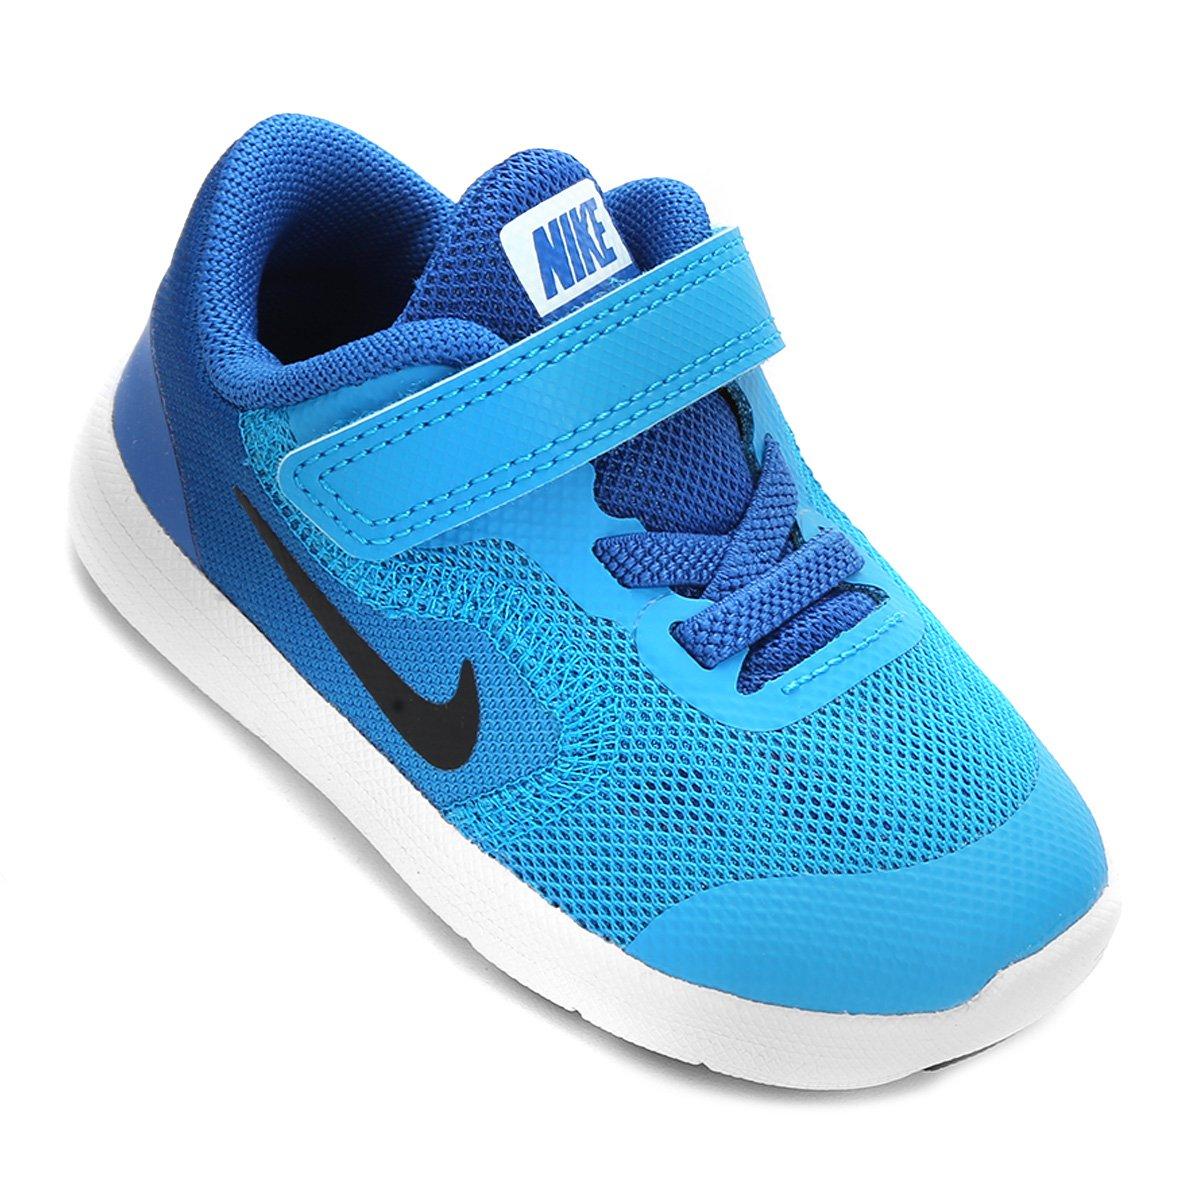 740fa6d568 Tênis Infantil Nike Revolution 3 - Azul e Branco